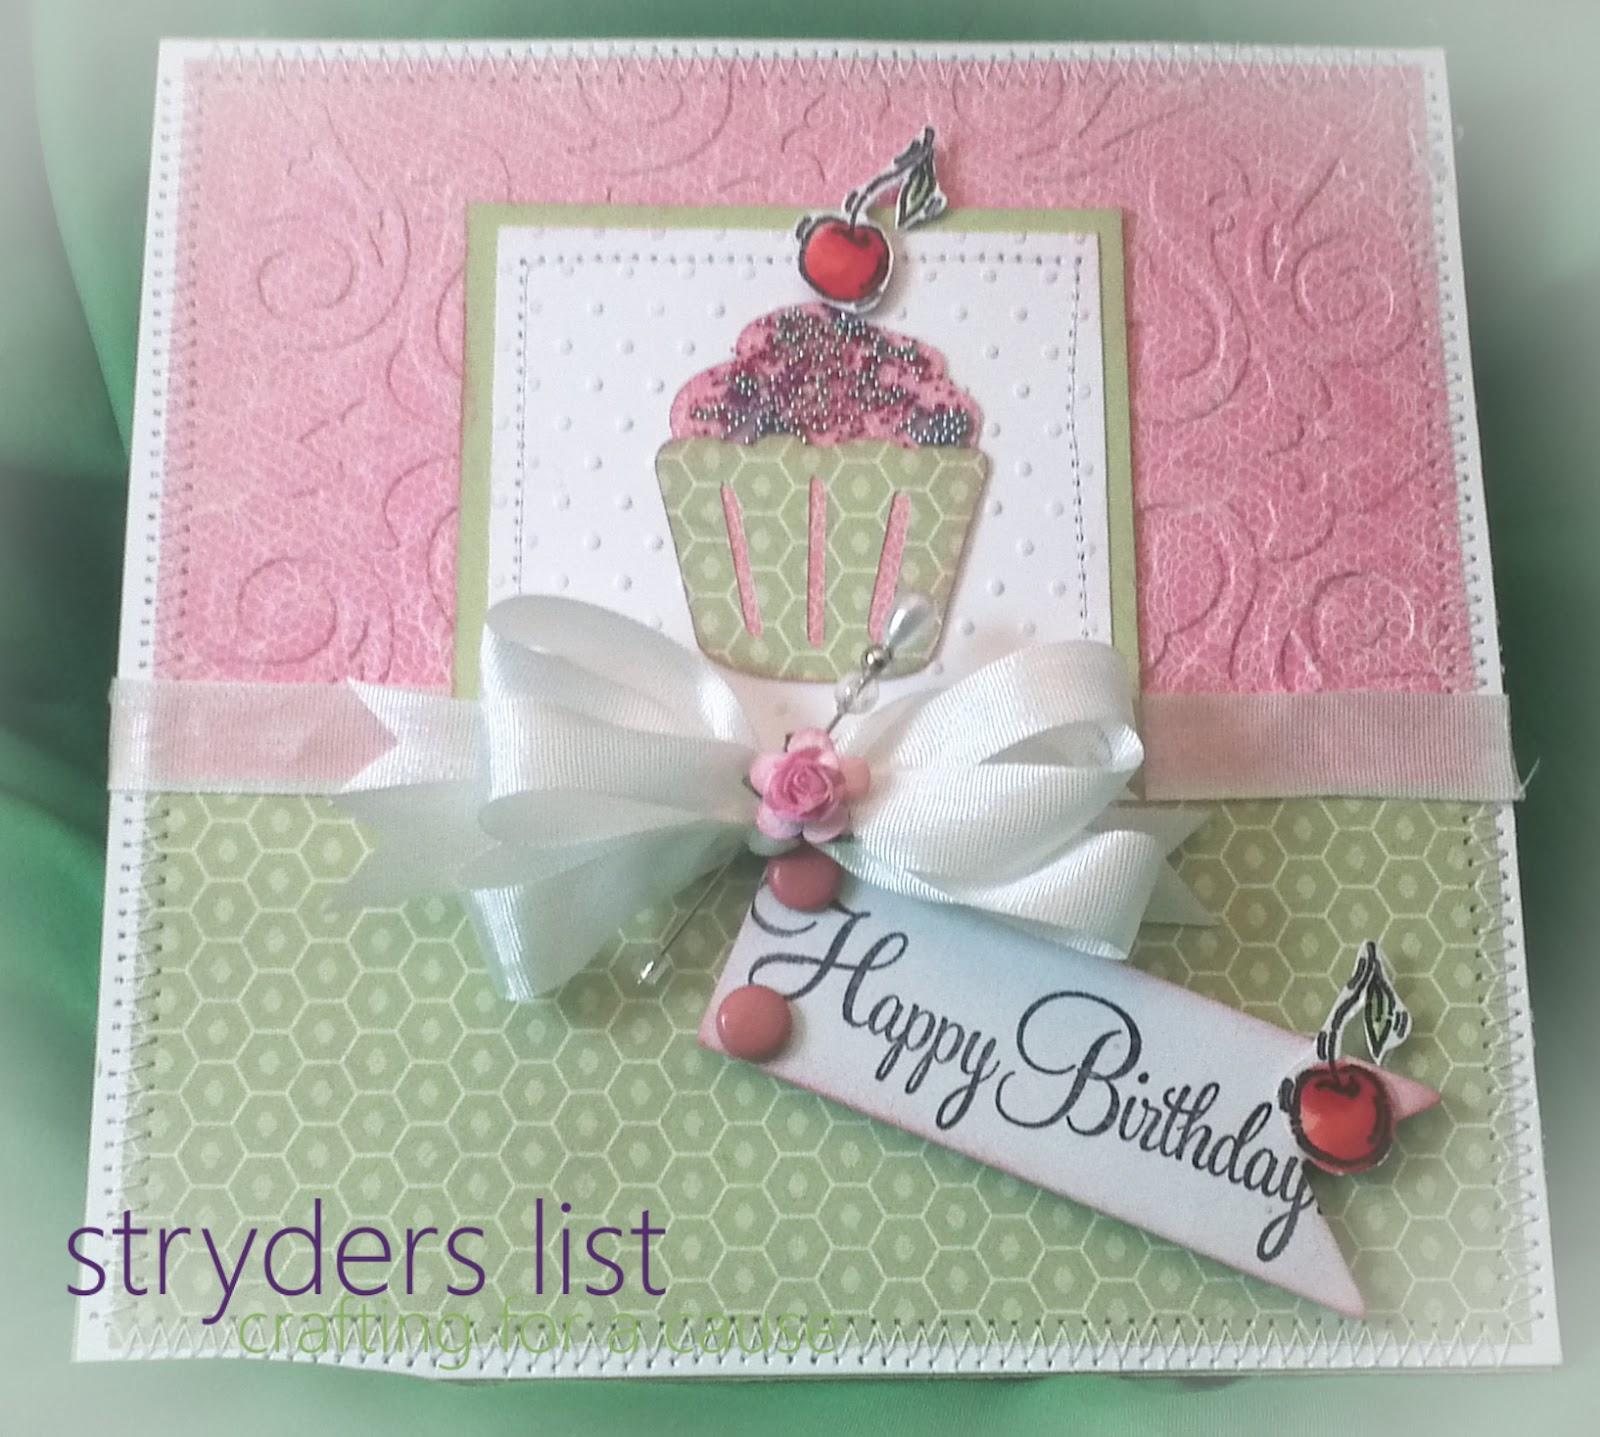 *STRYDERS LIST*: Happy Birthday Card